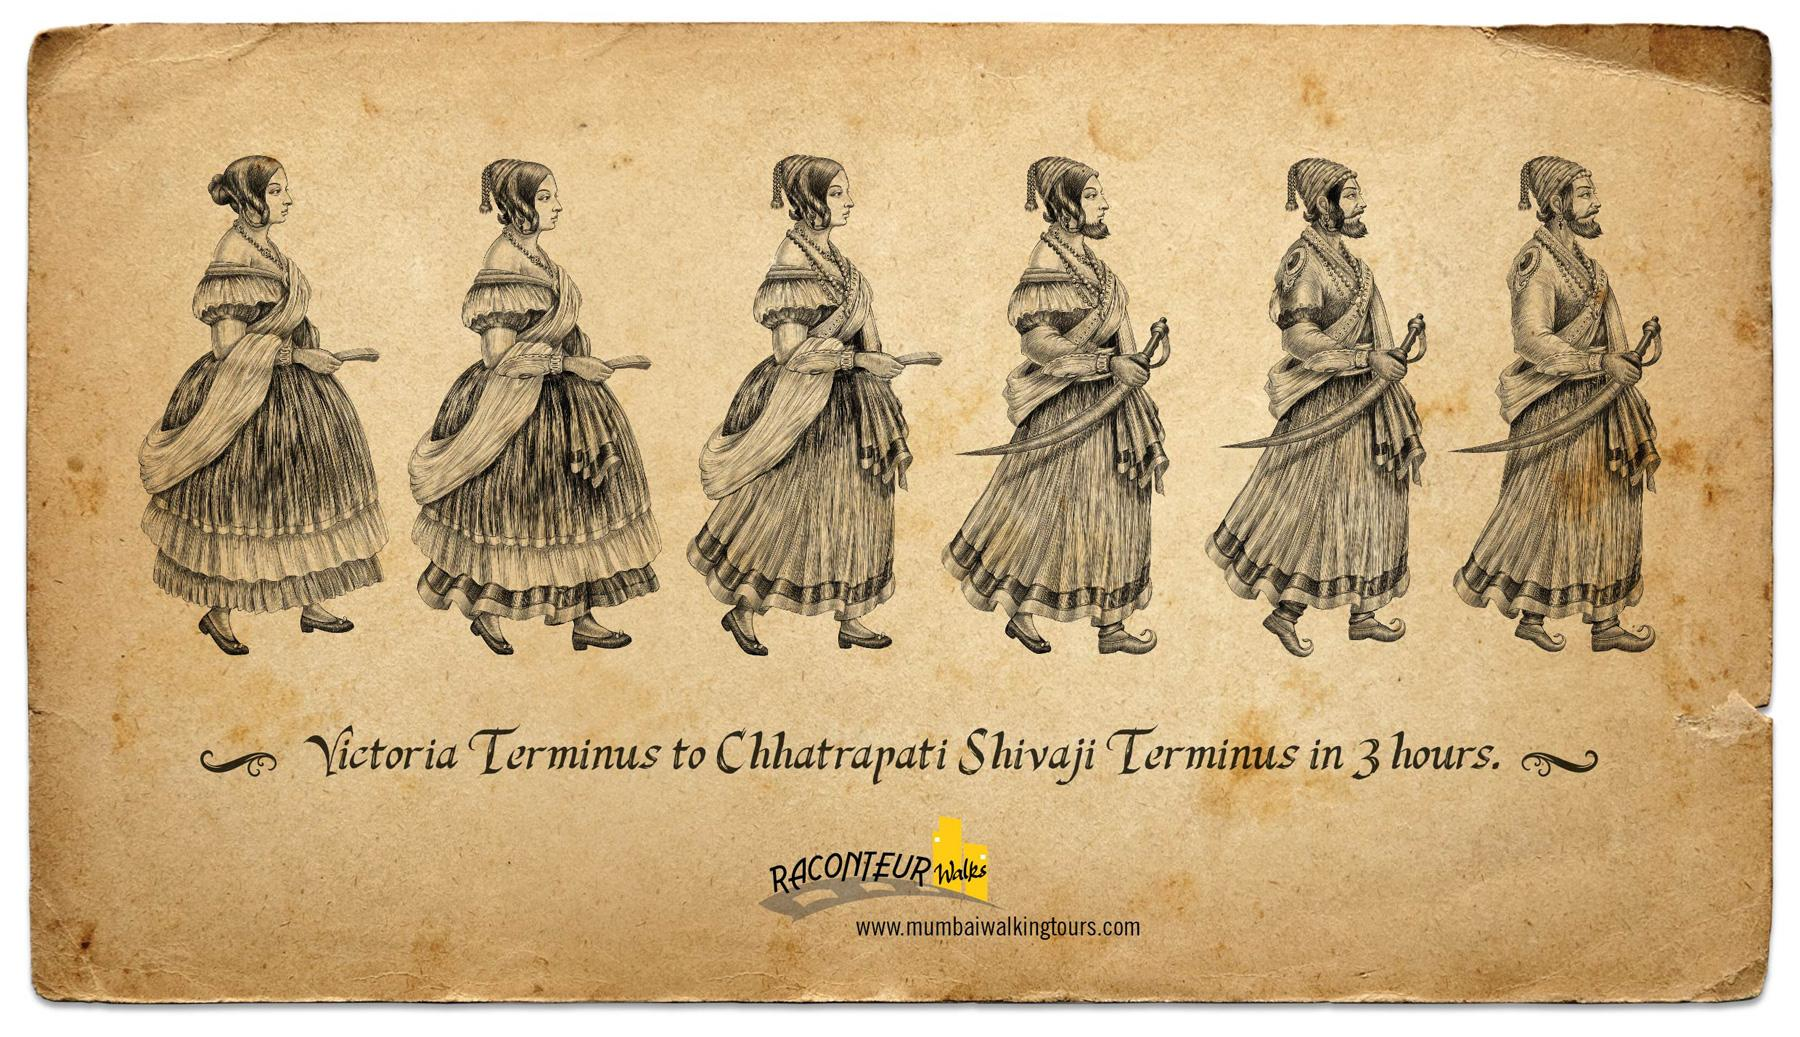 Raconteur Walks Print Ad -  Victoria Terminus to Chhatrapati Shivaji Terminus